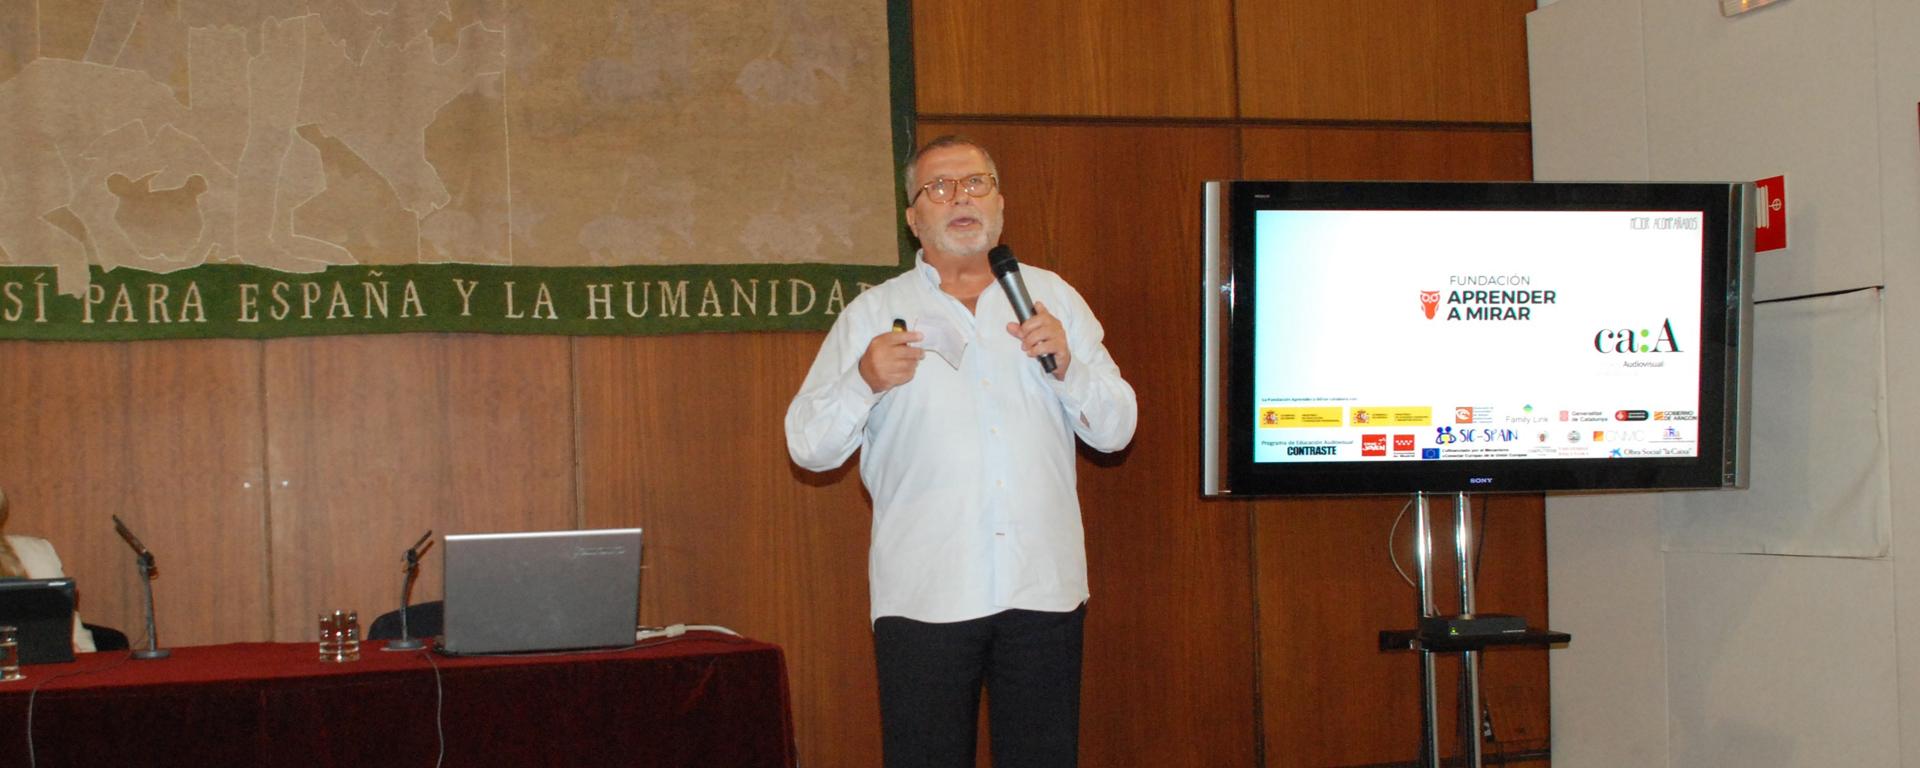 FAAM Domingo Consejo Audiovisual Andalucía.jpg